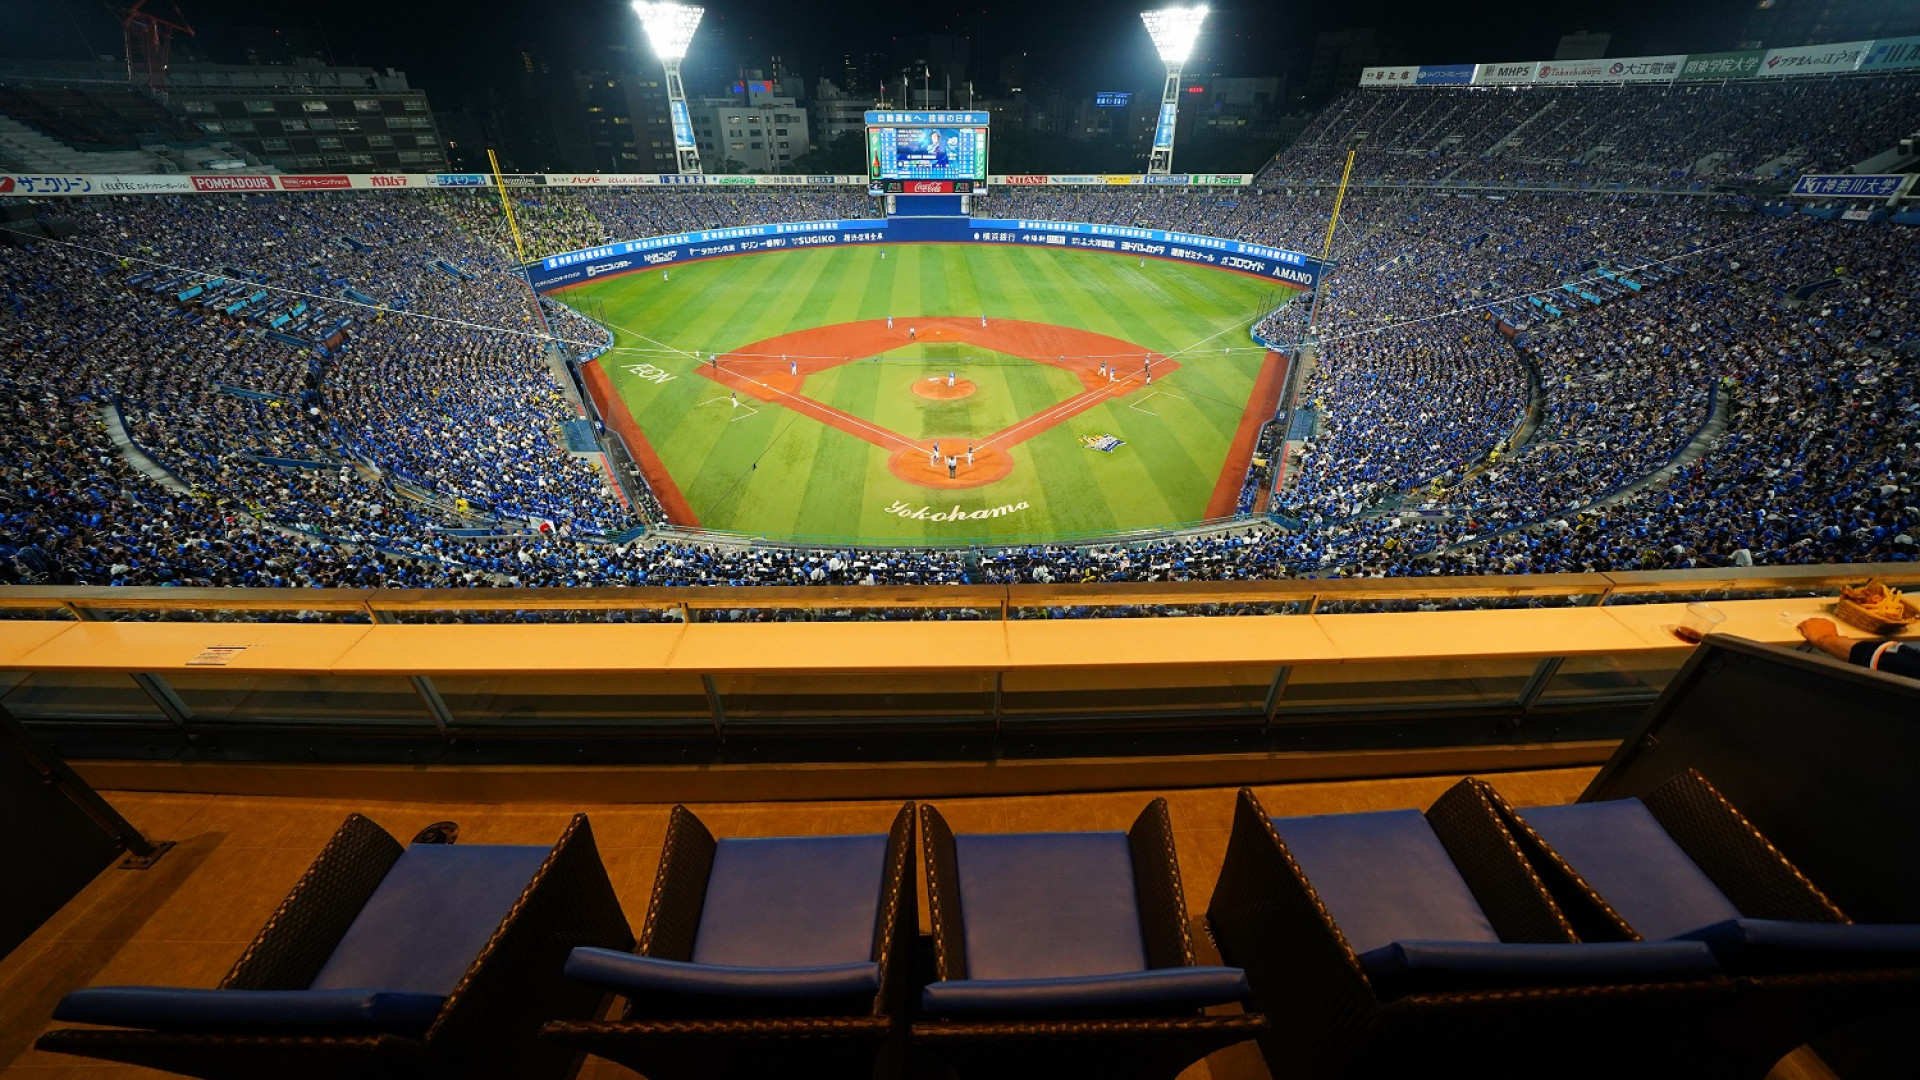 NISSAN STAR SUITES (Stade de Yokohama)